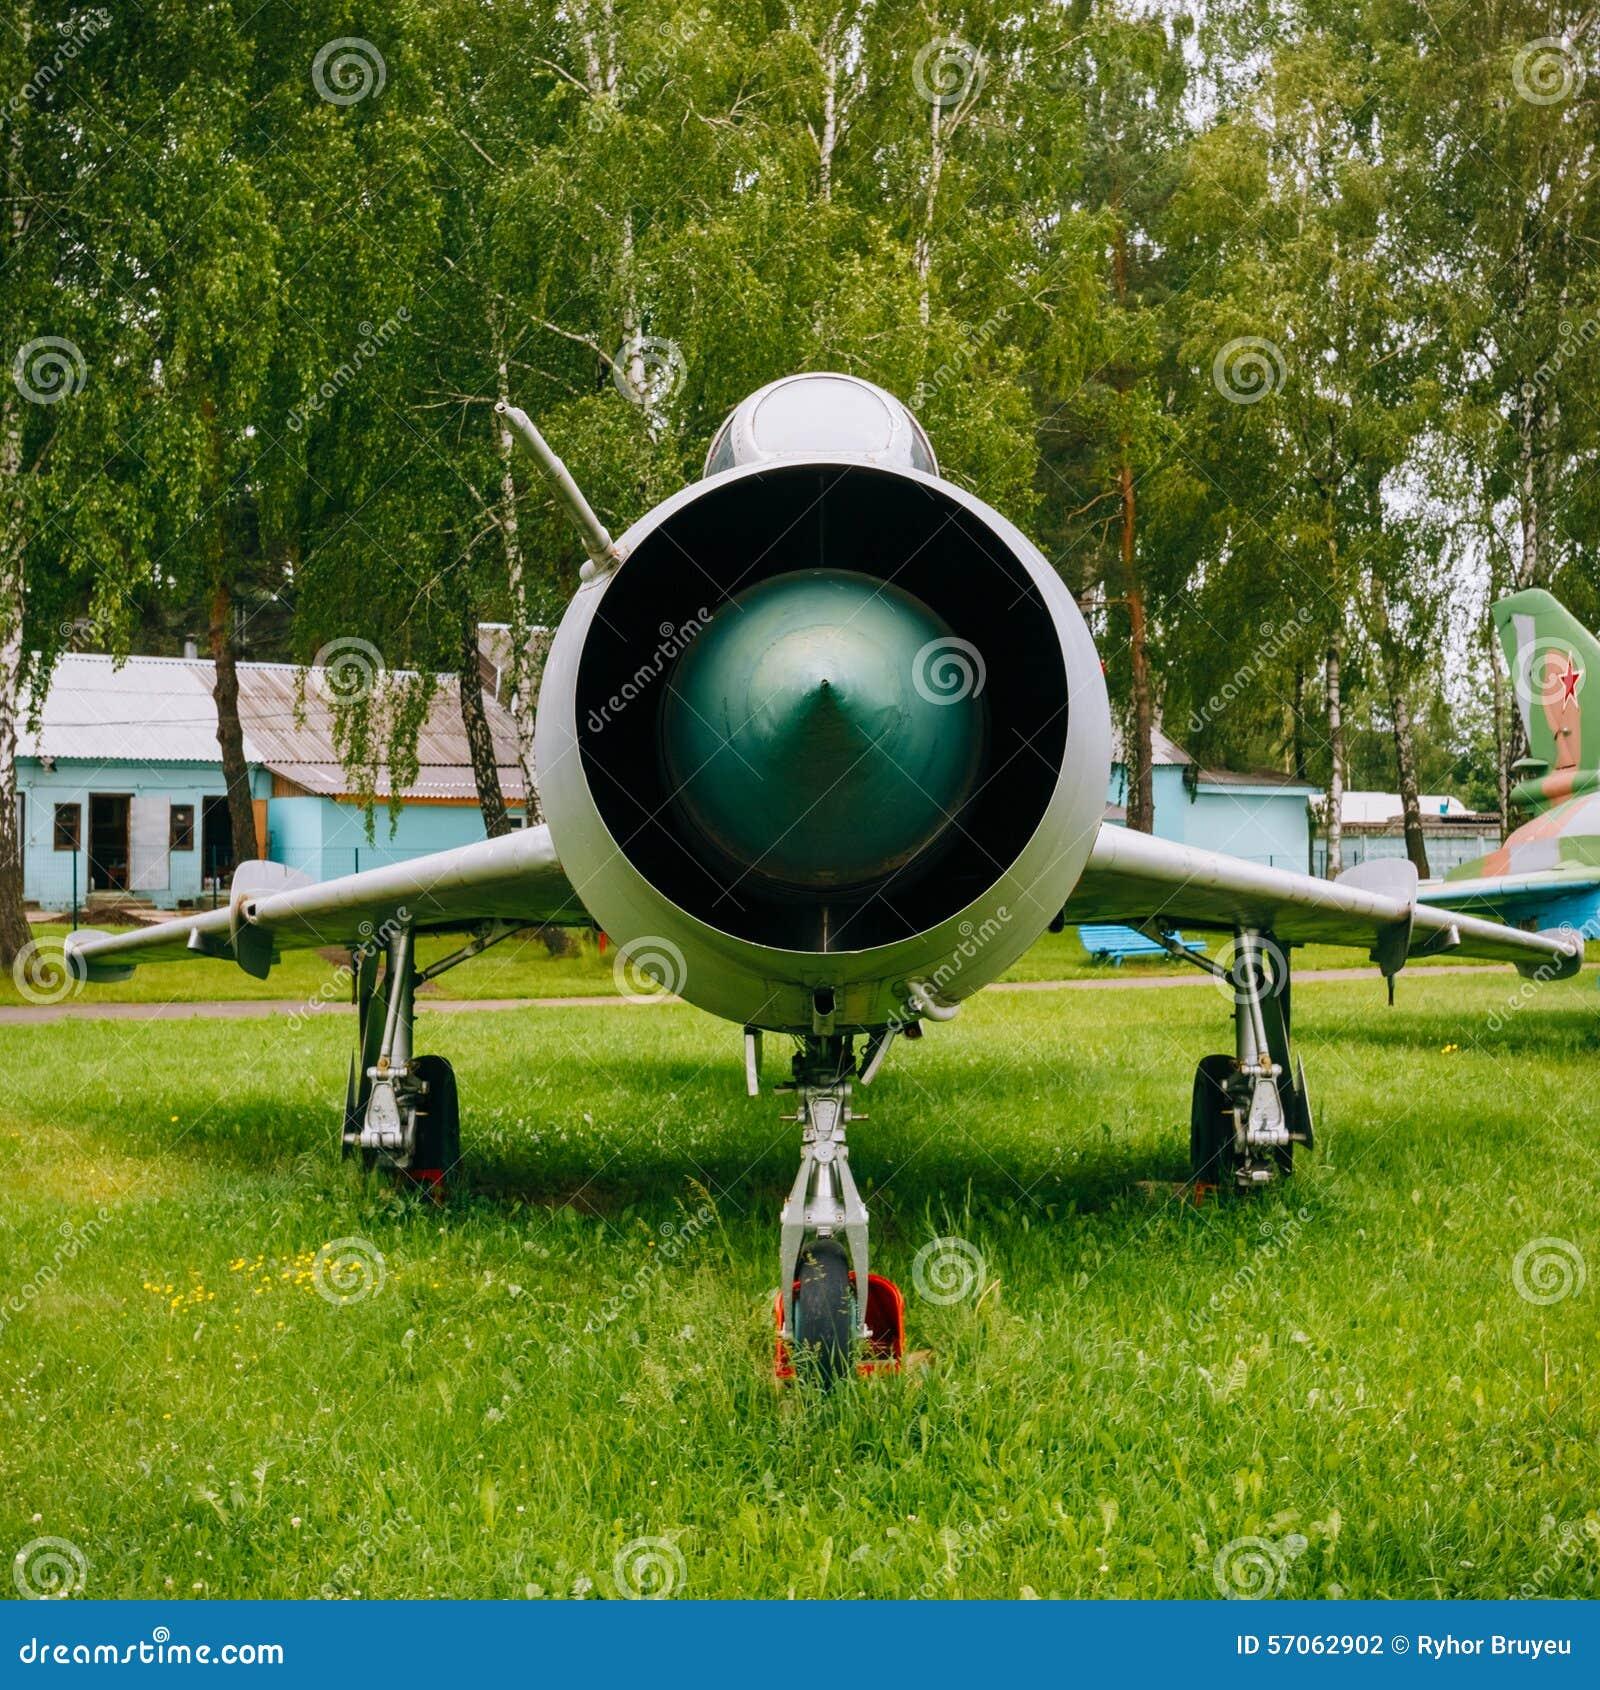 Su-7 Russische Sovjet binnen ontwikkelde jachtbommenwerper